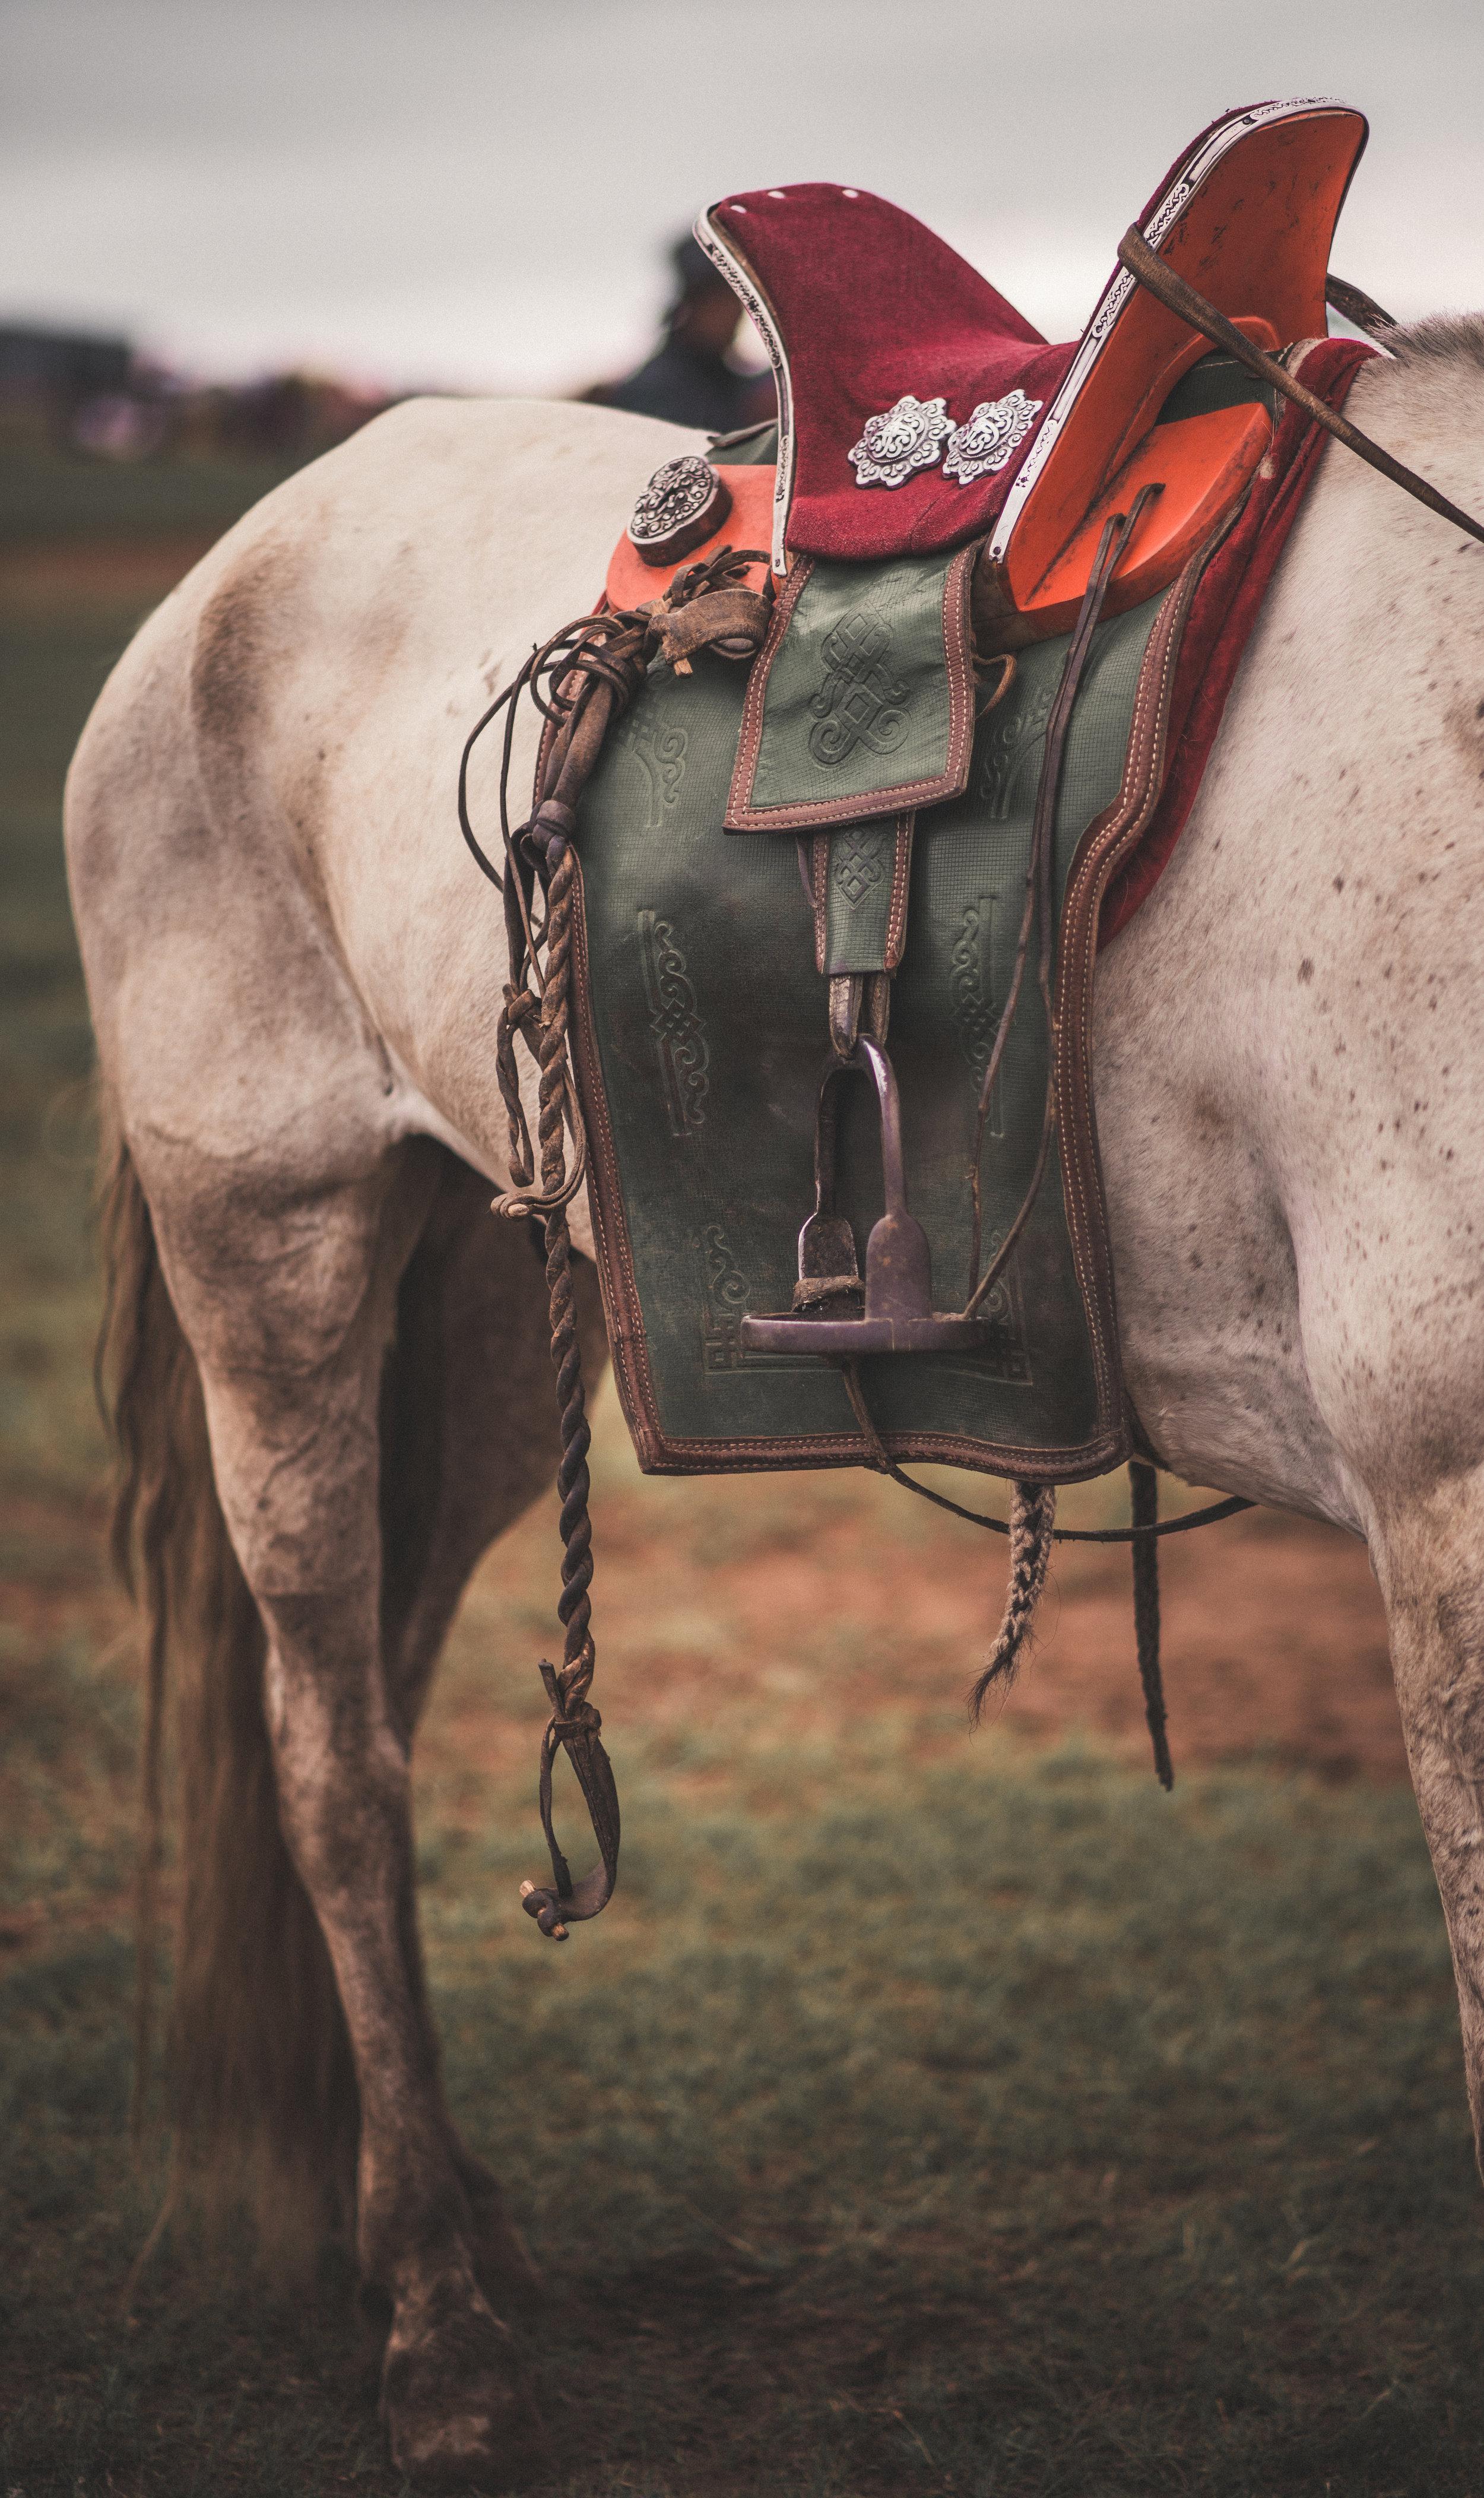 HorseRacing1 copy.jpg